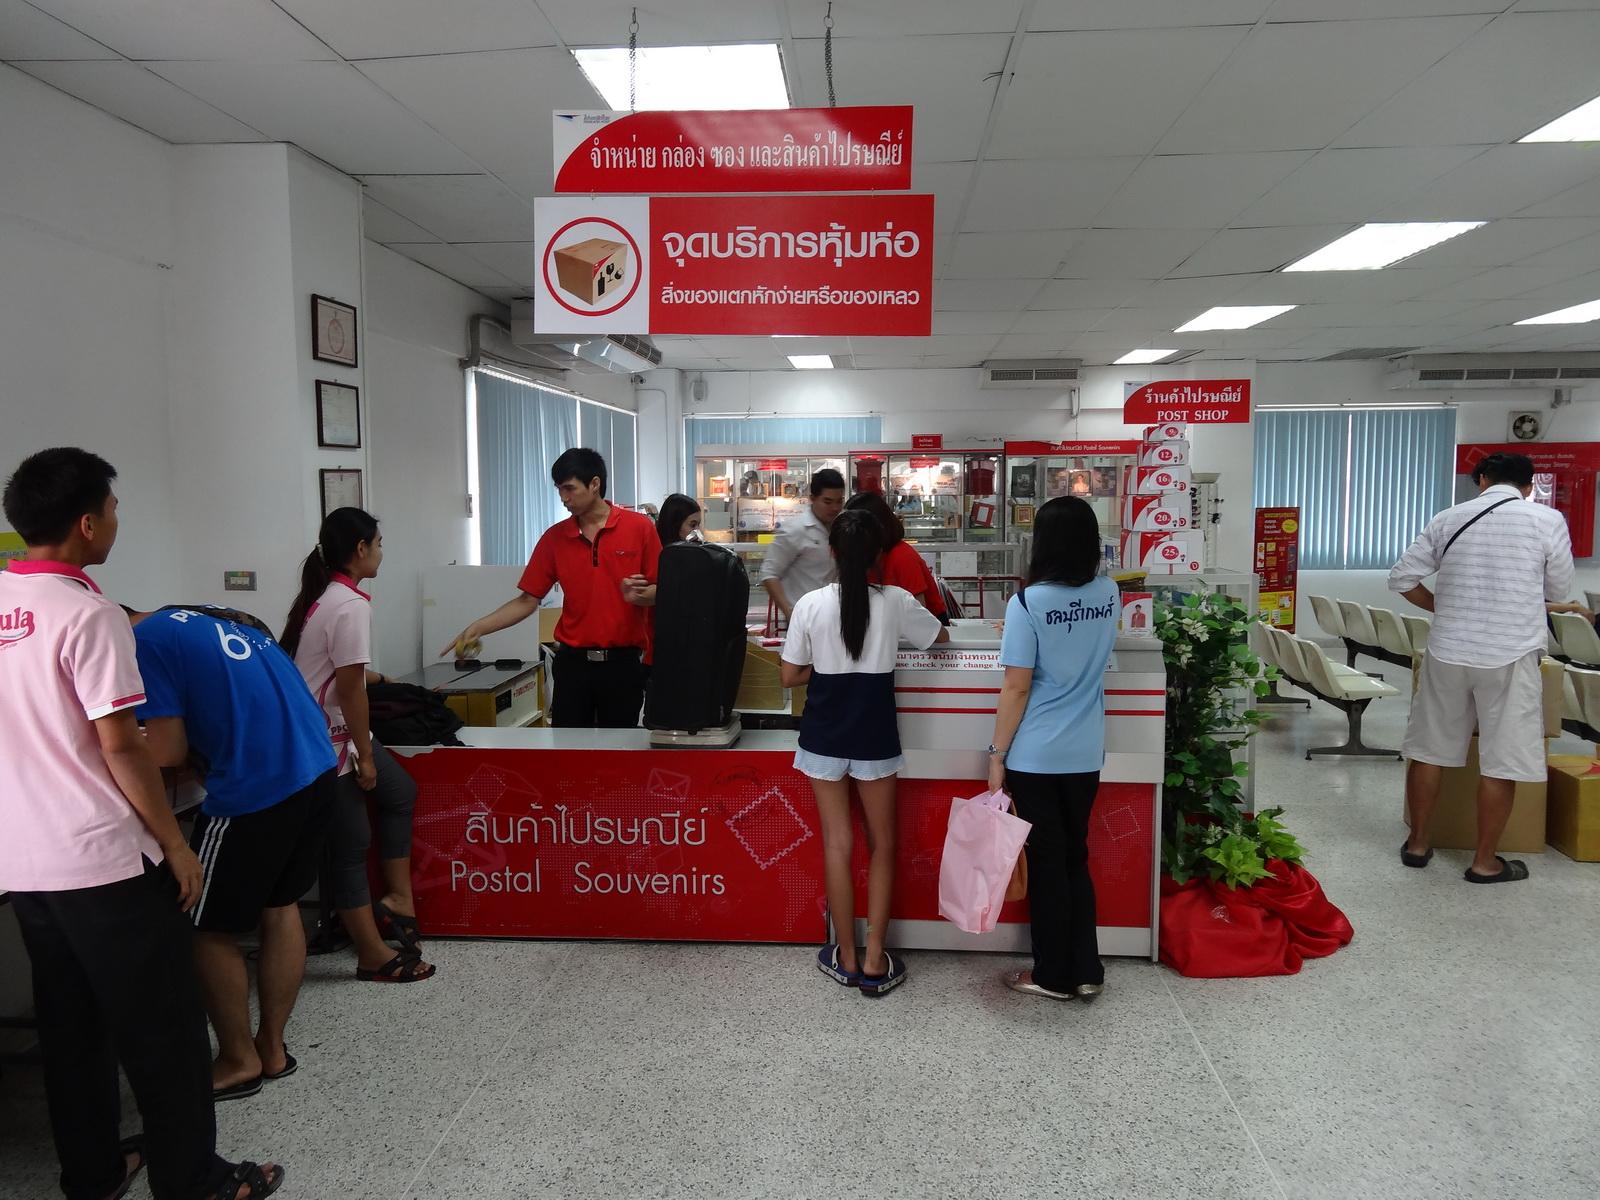 01 Pattaya 136